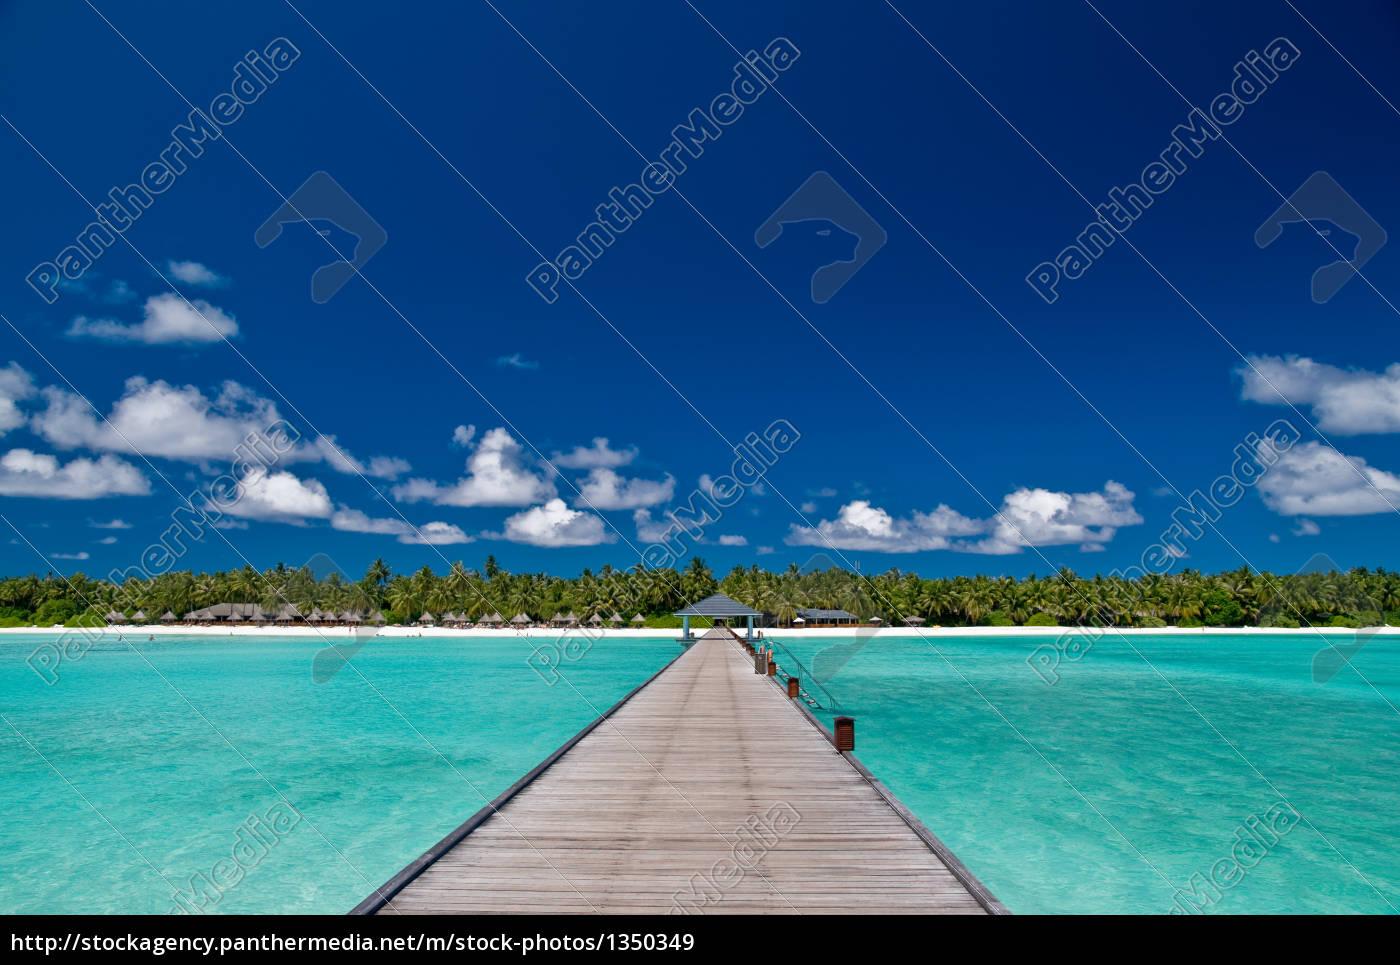 bridge, on, the, beach - 1350349